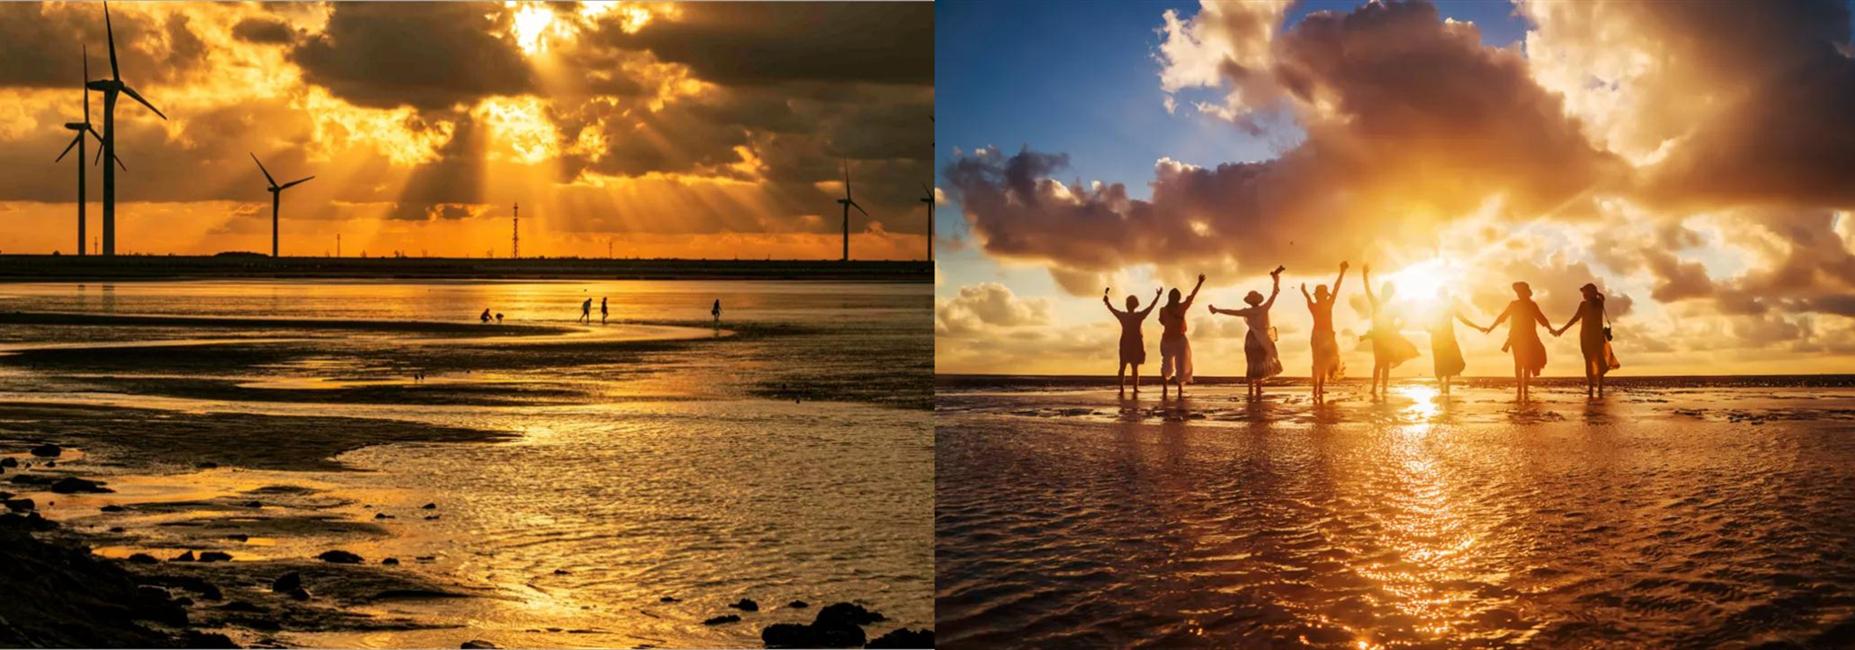 Enjoy sunrise at Golden Beach